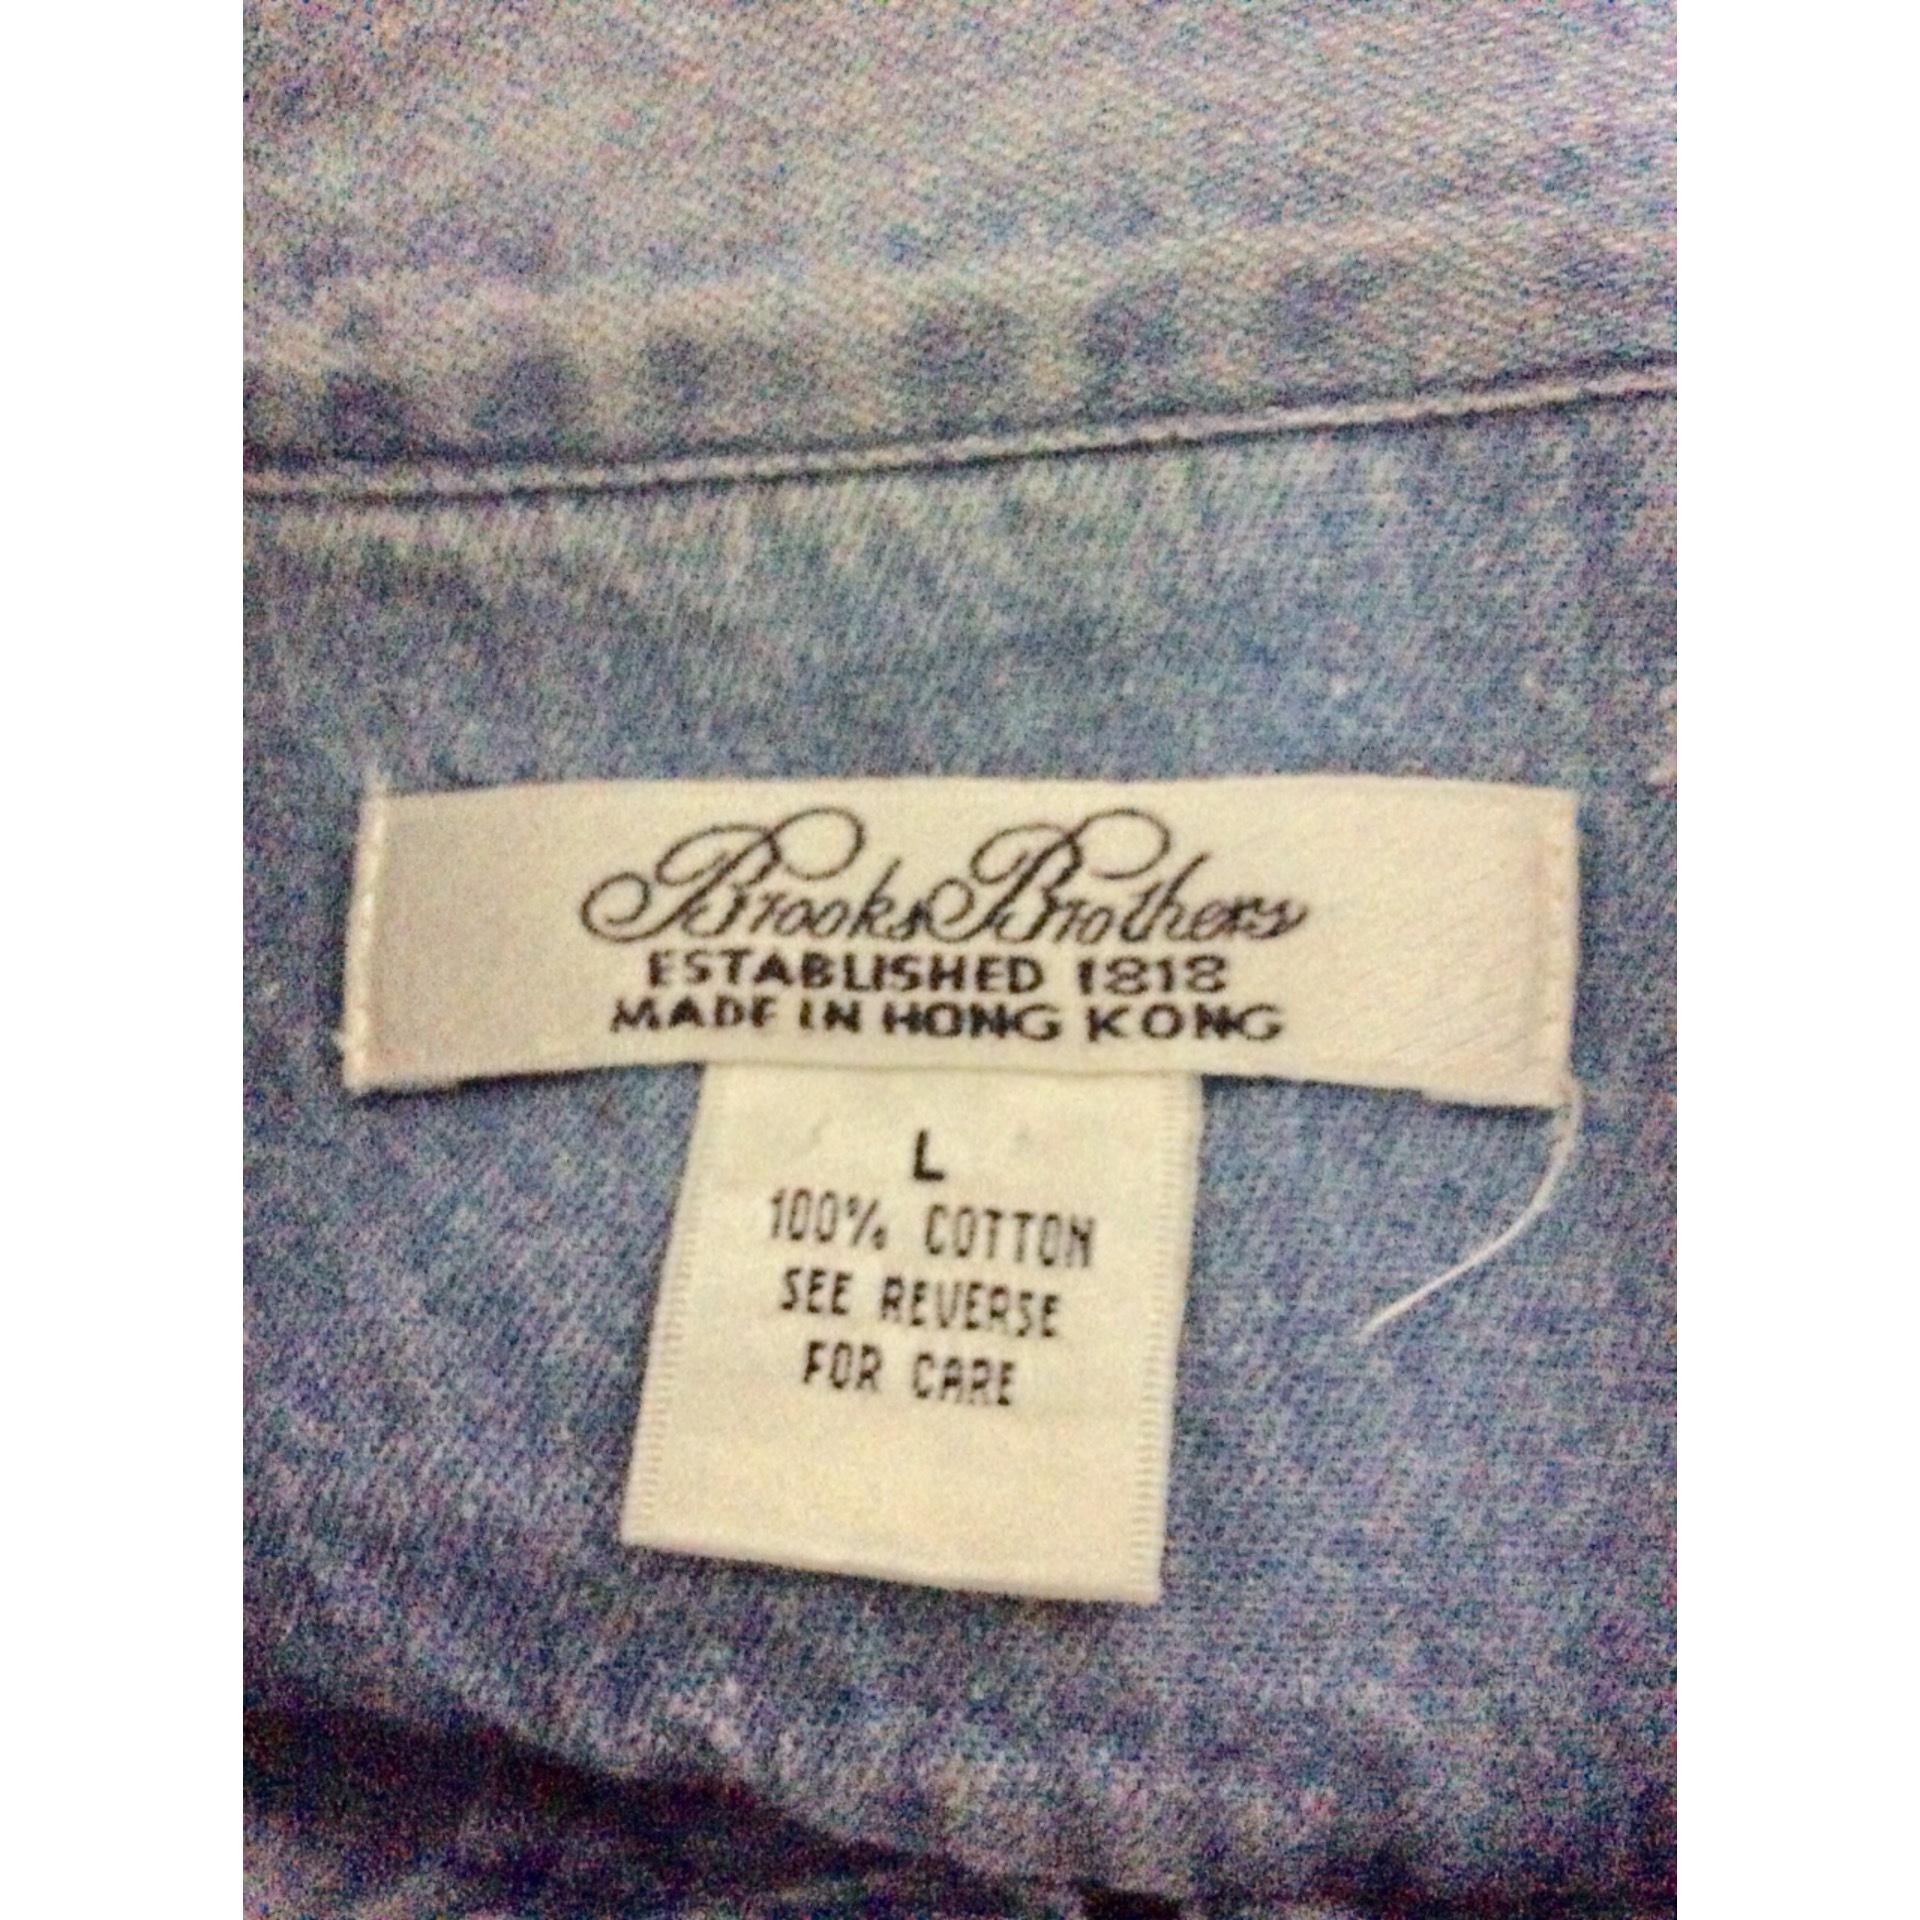 Vintage denim china shirt by Brooks Brothers